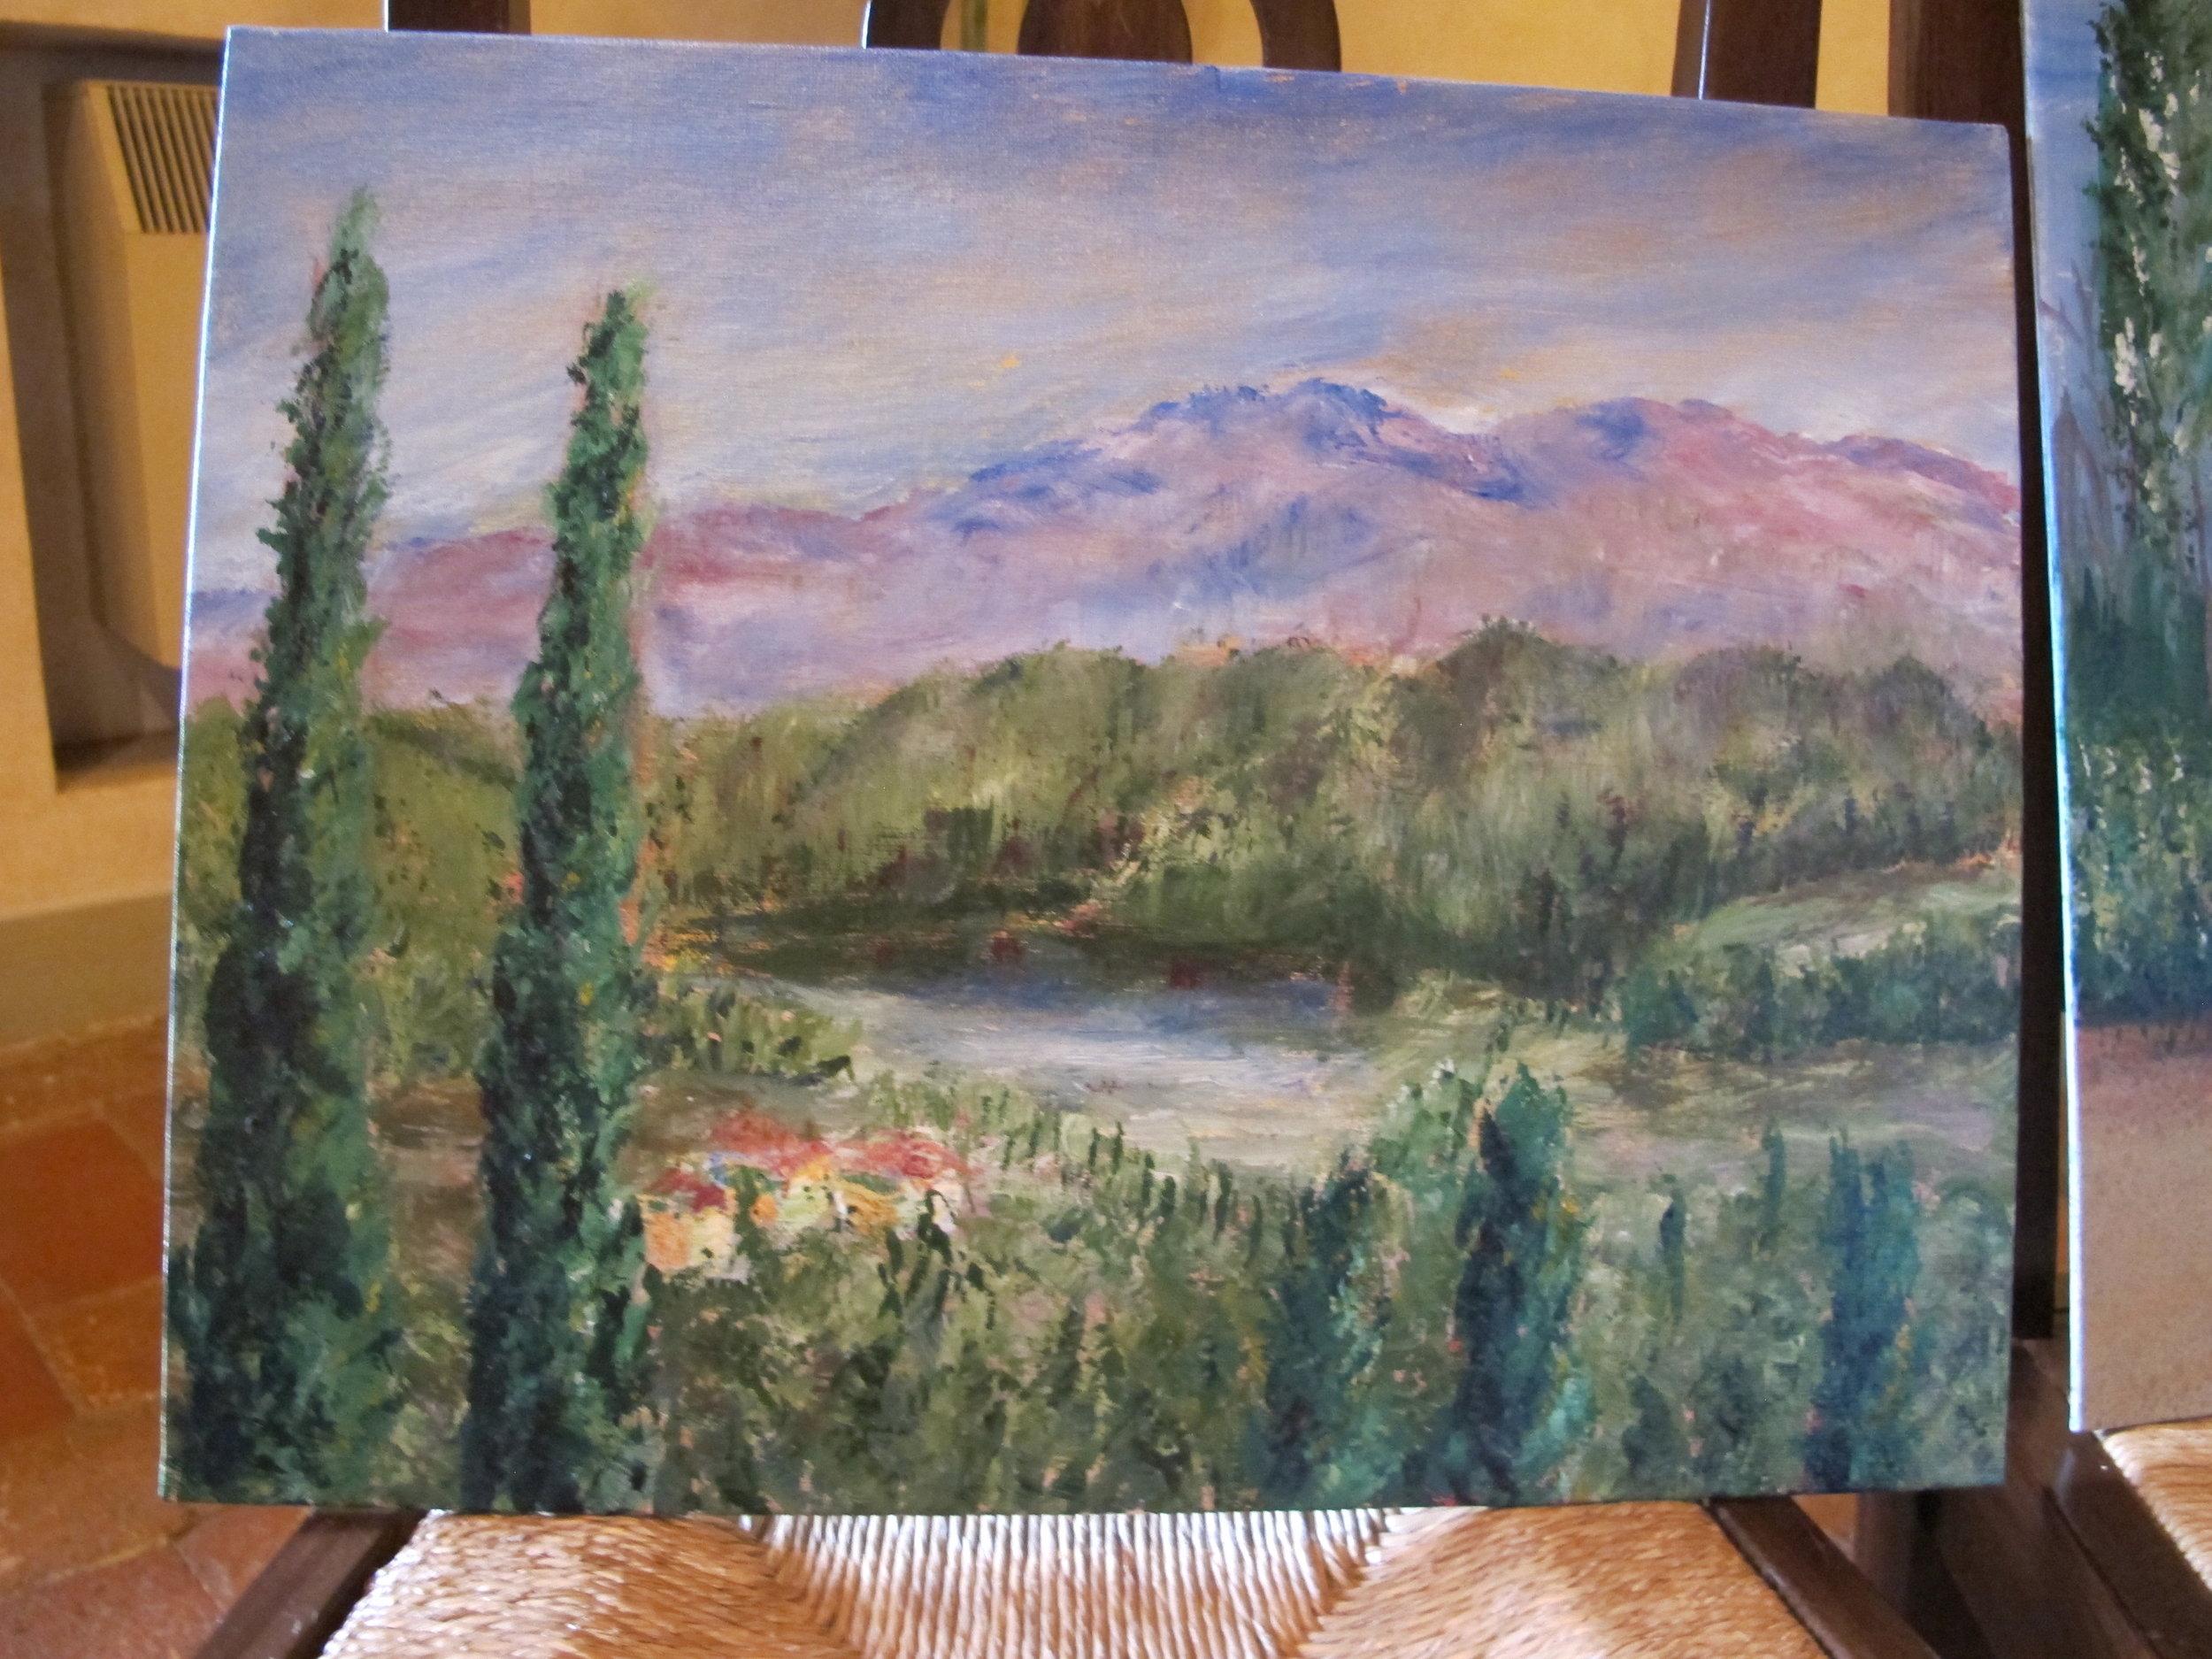 painting ItalyJPG.JPG